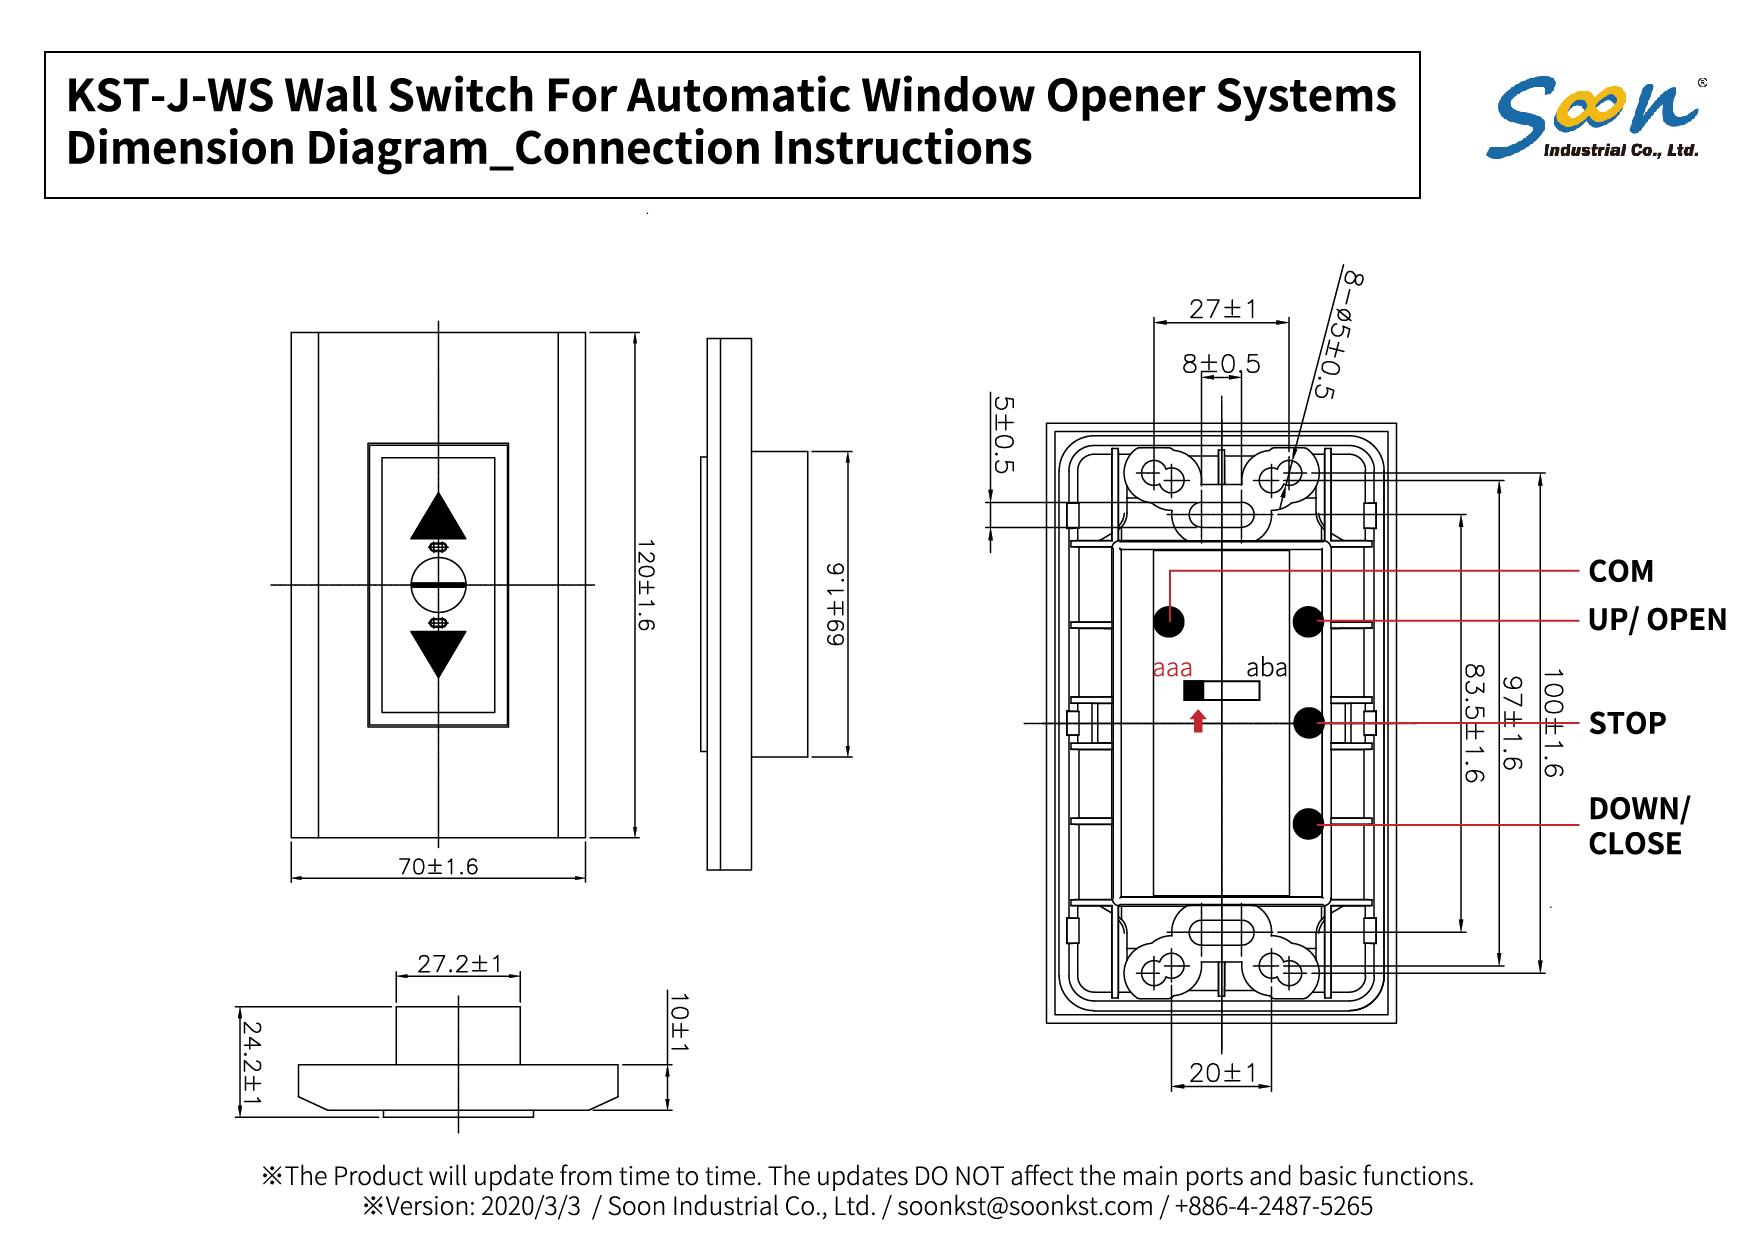 KST-WS-J120 Wall Switch dimension drawings